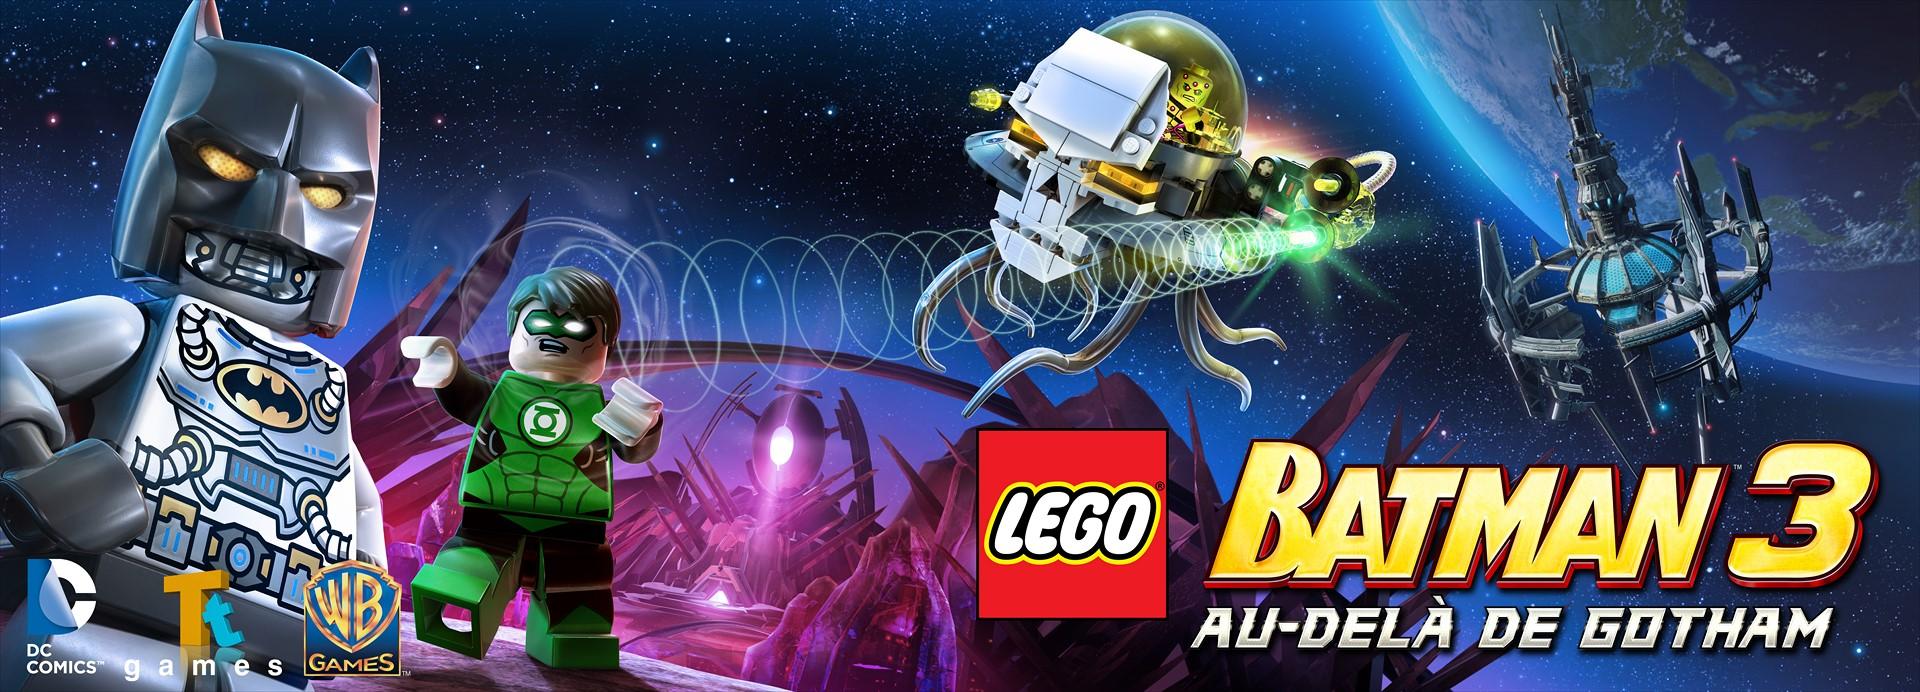 lego-batman-3-au-dela-de-gotham_1401263021